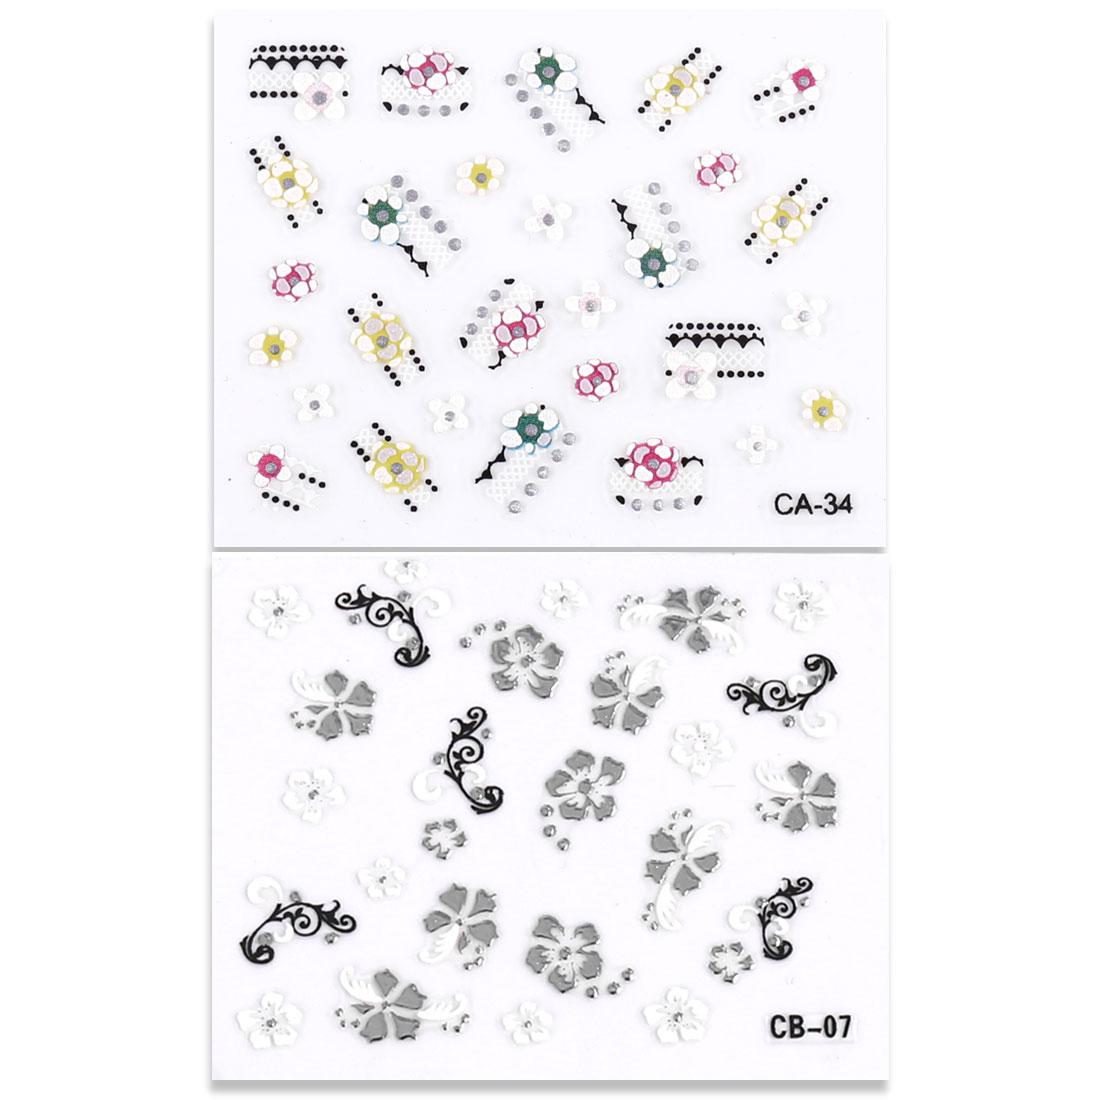 Colorful 3D Flower Design Nail Art Fingernail Sticker Sheet 2 Pcs